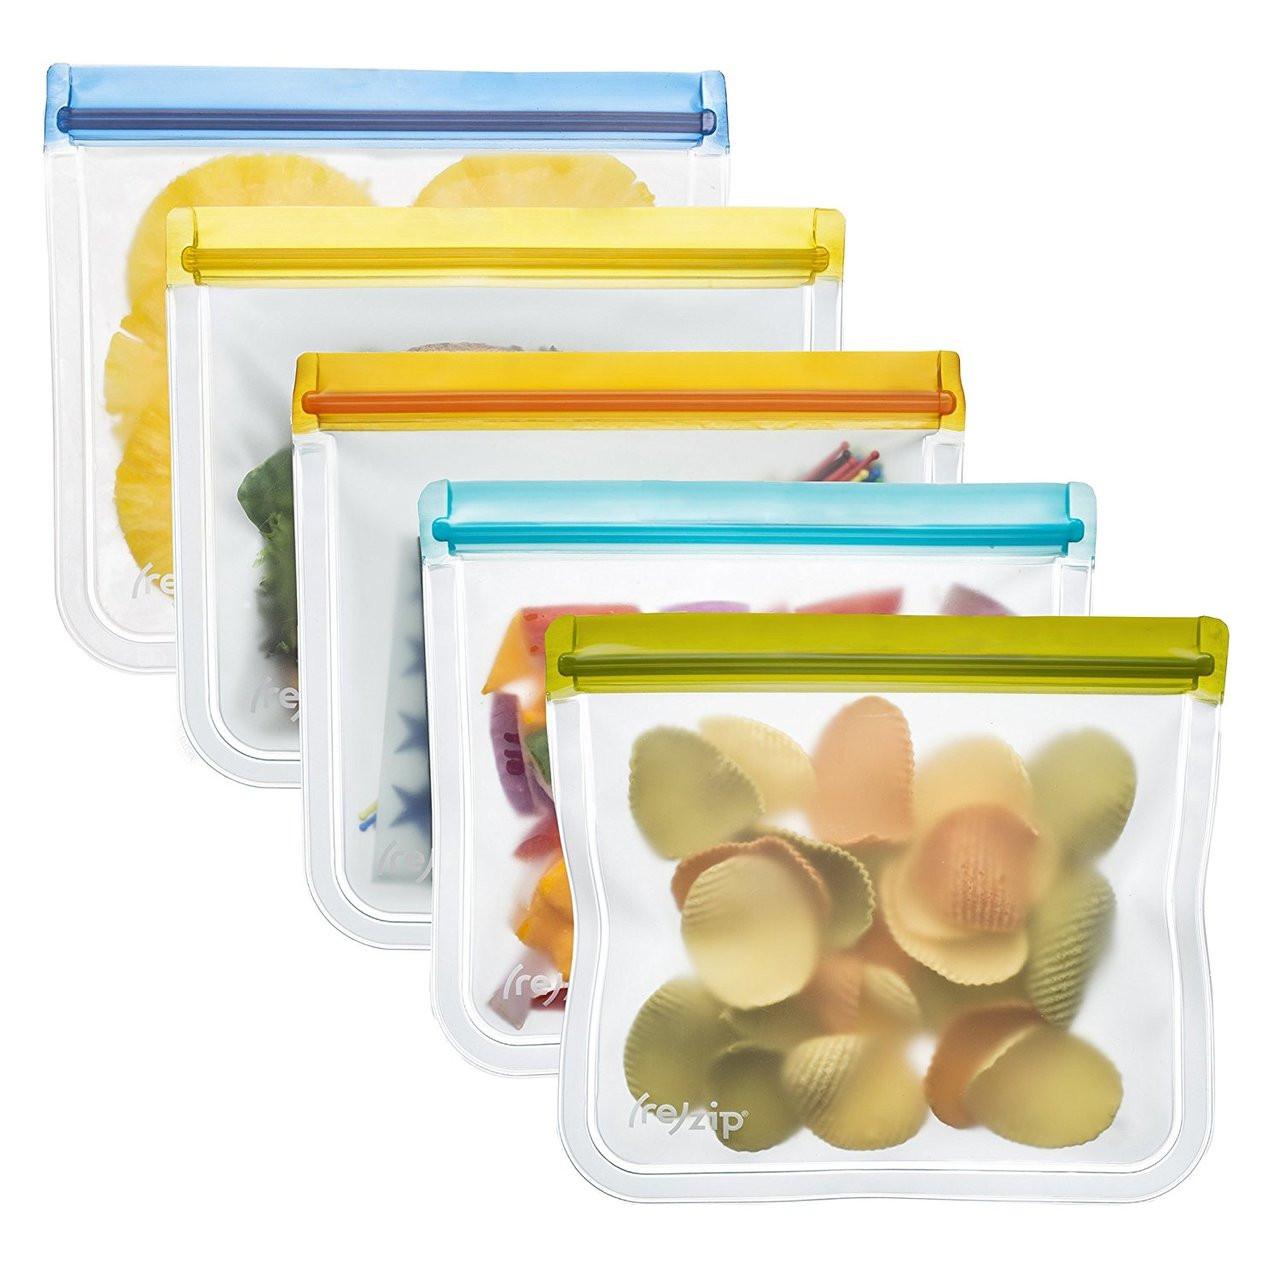 (re)zip Leakproof Reusable Lunch Storage Bags (5-Pack)